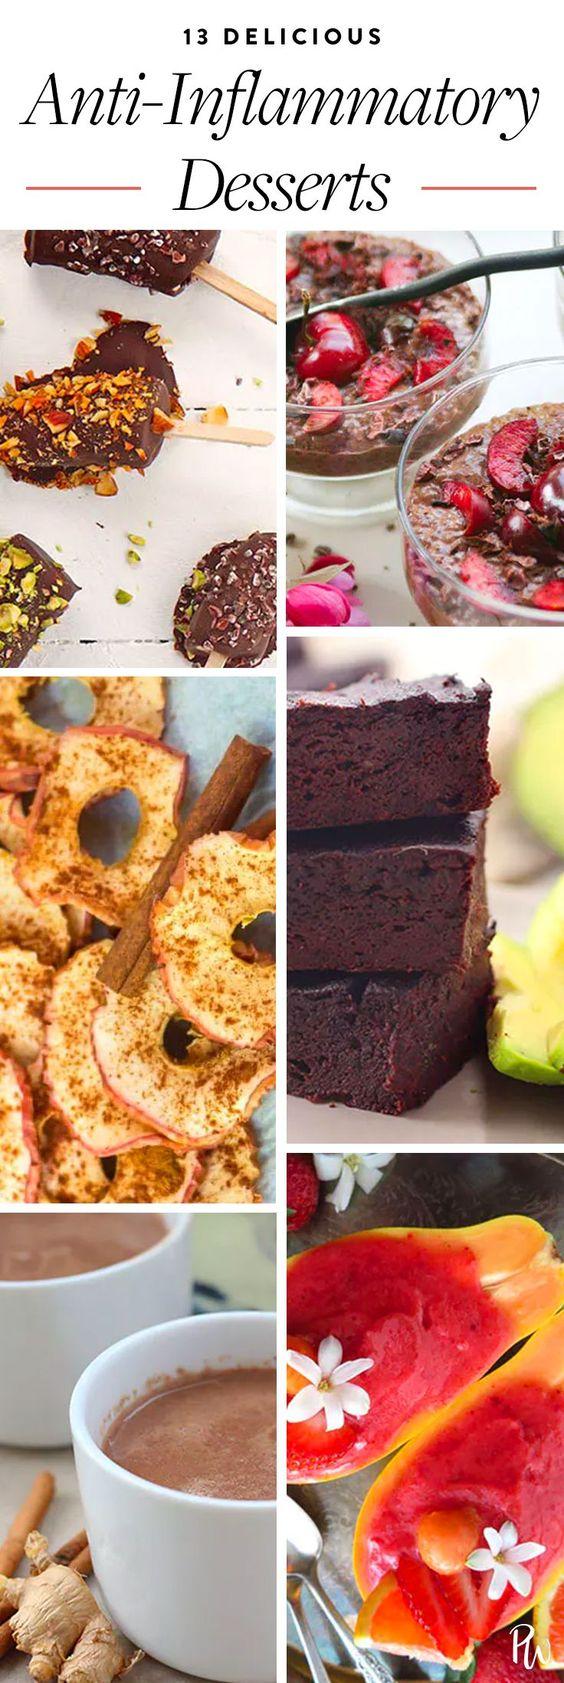 desserts for anti inflammatory diet